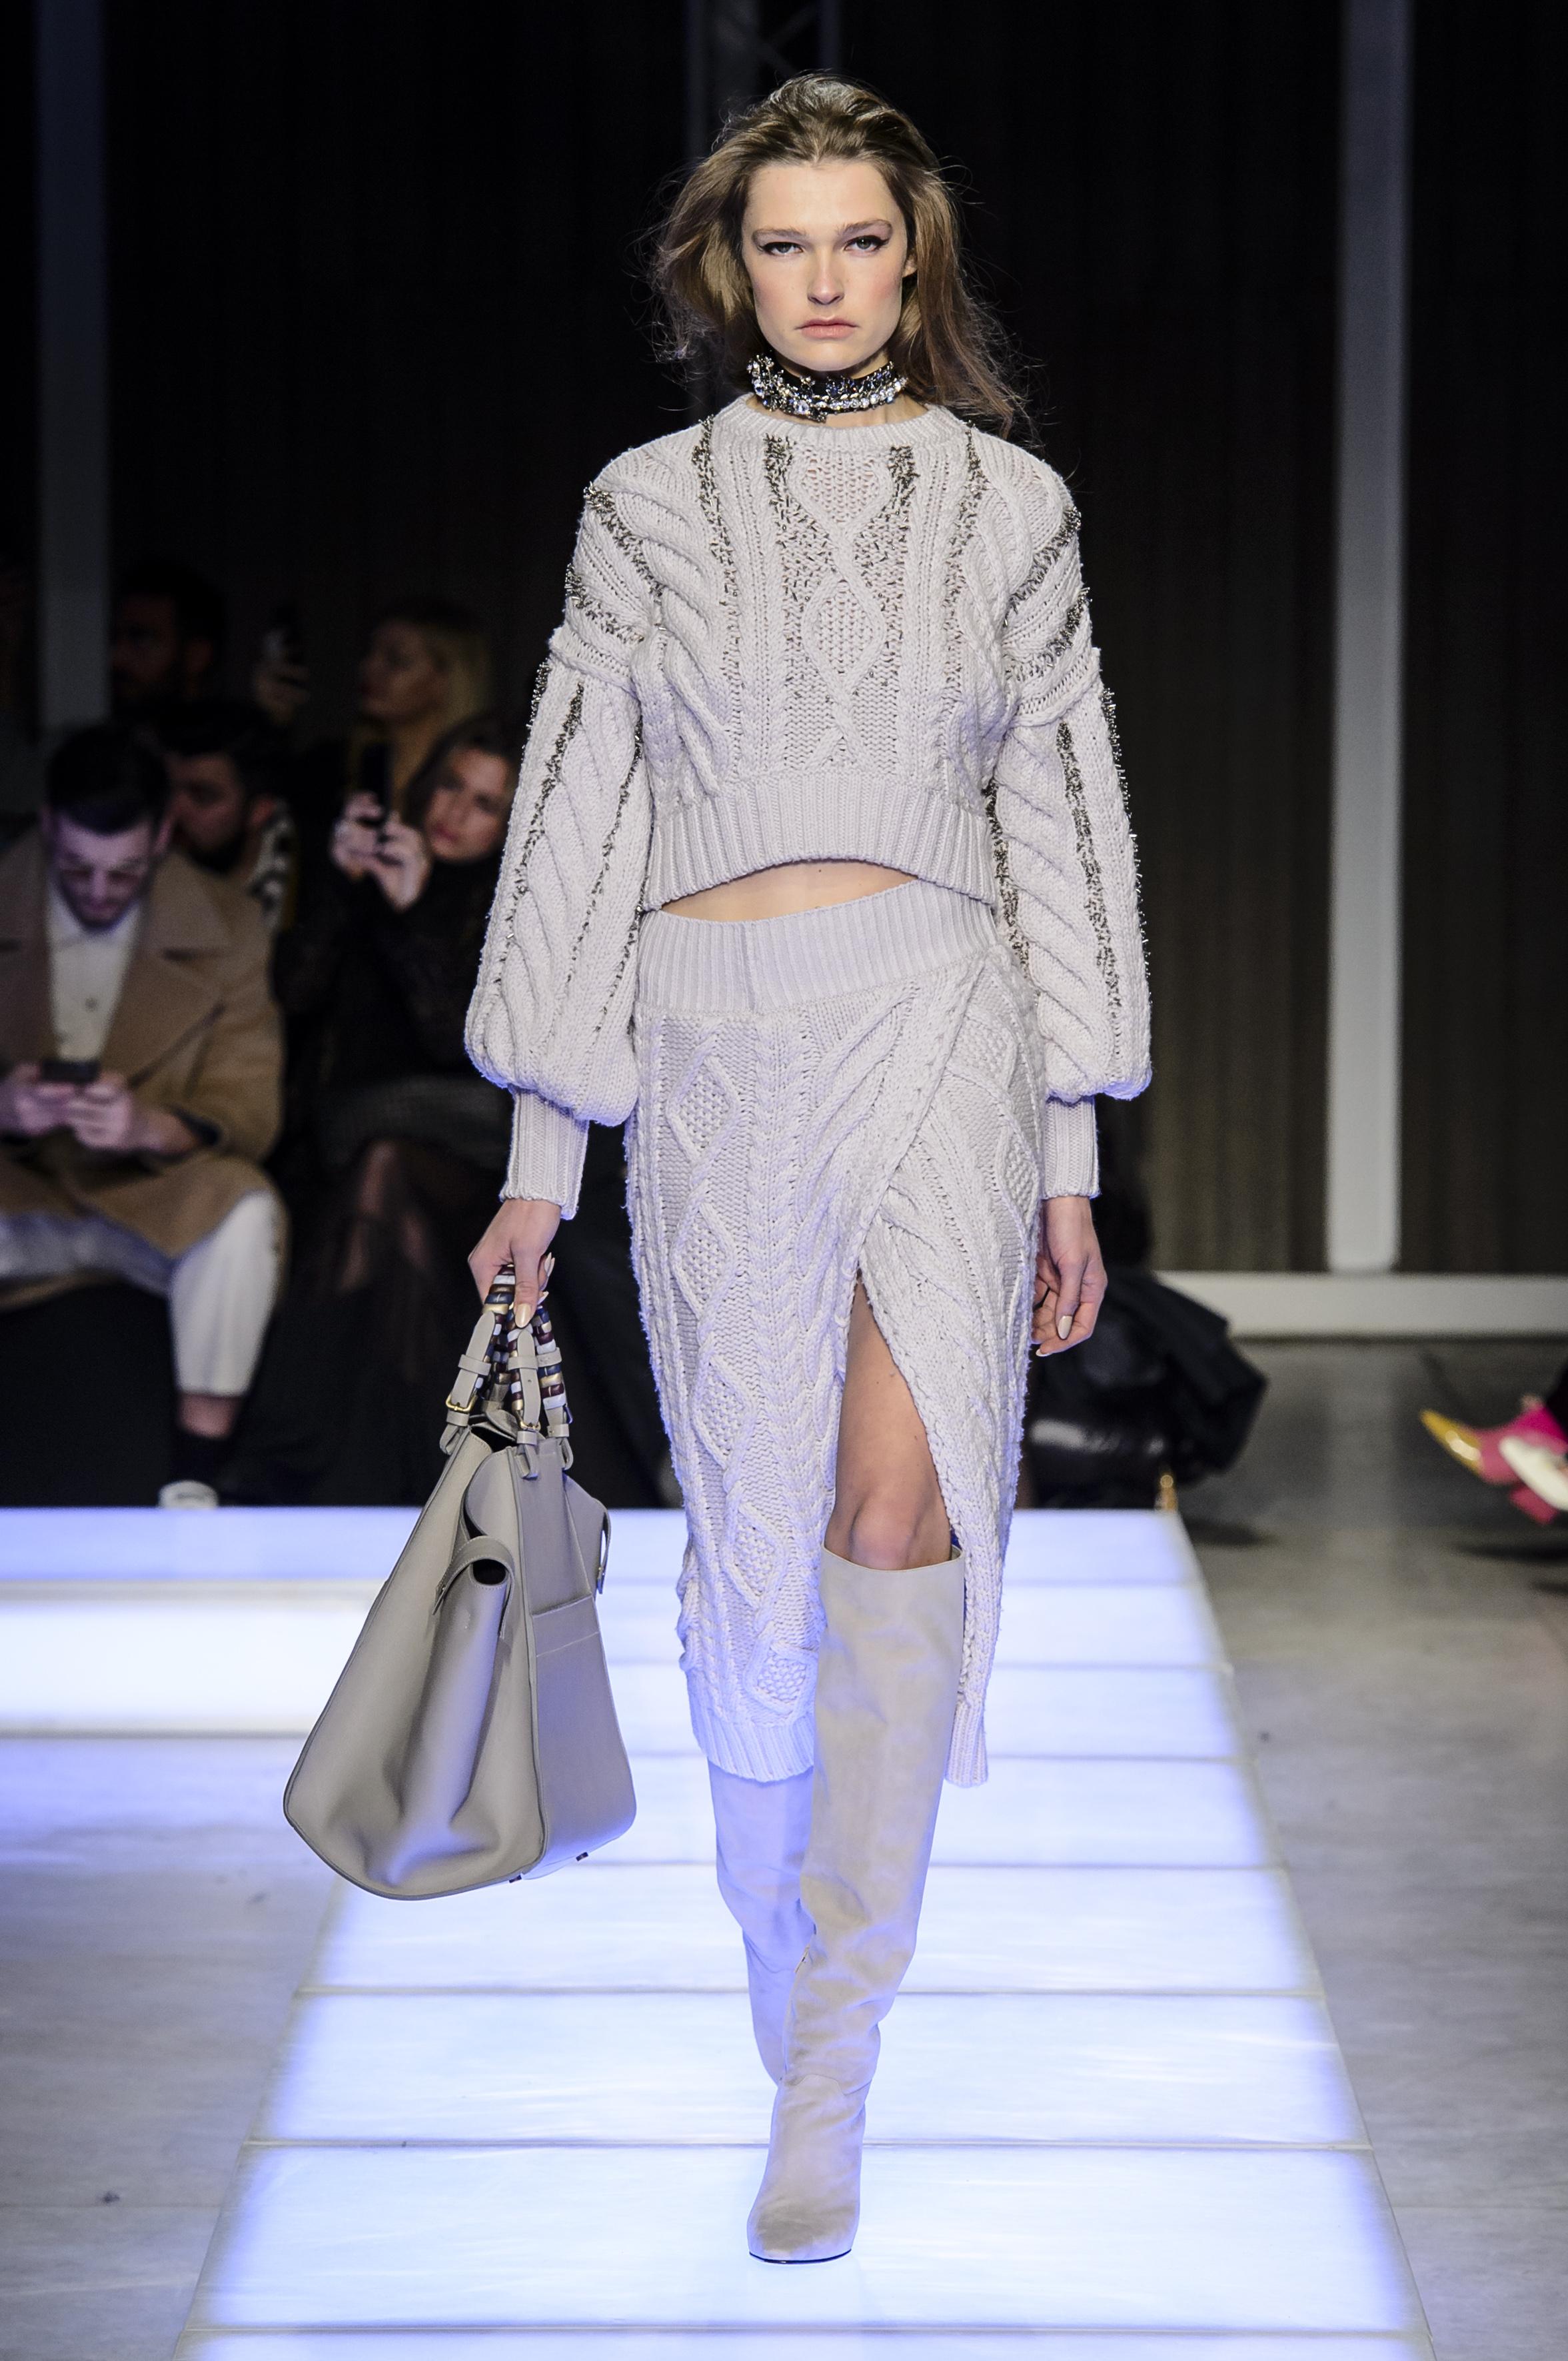 Completo di lana Les Copains